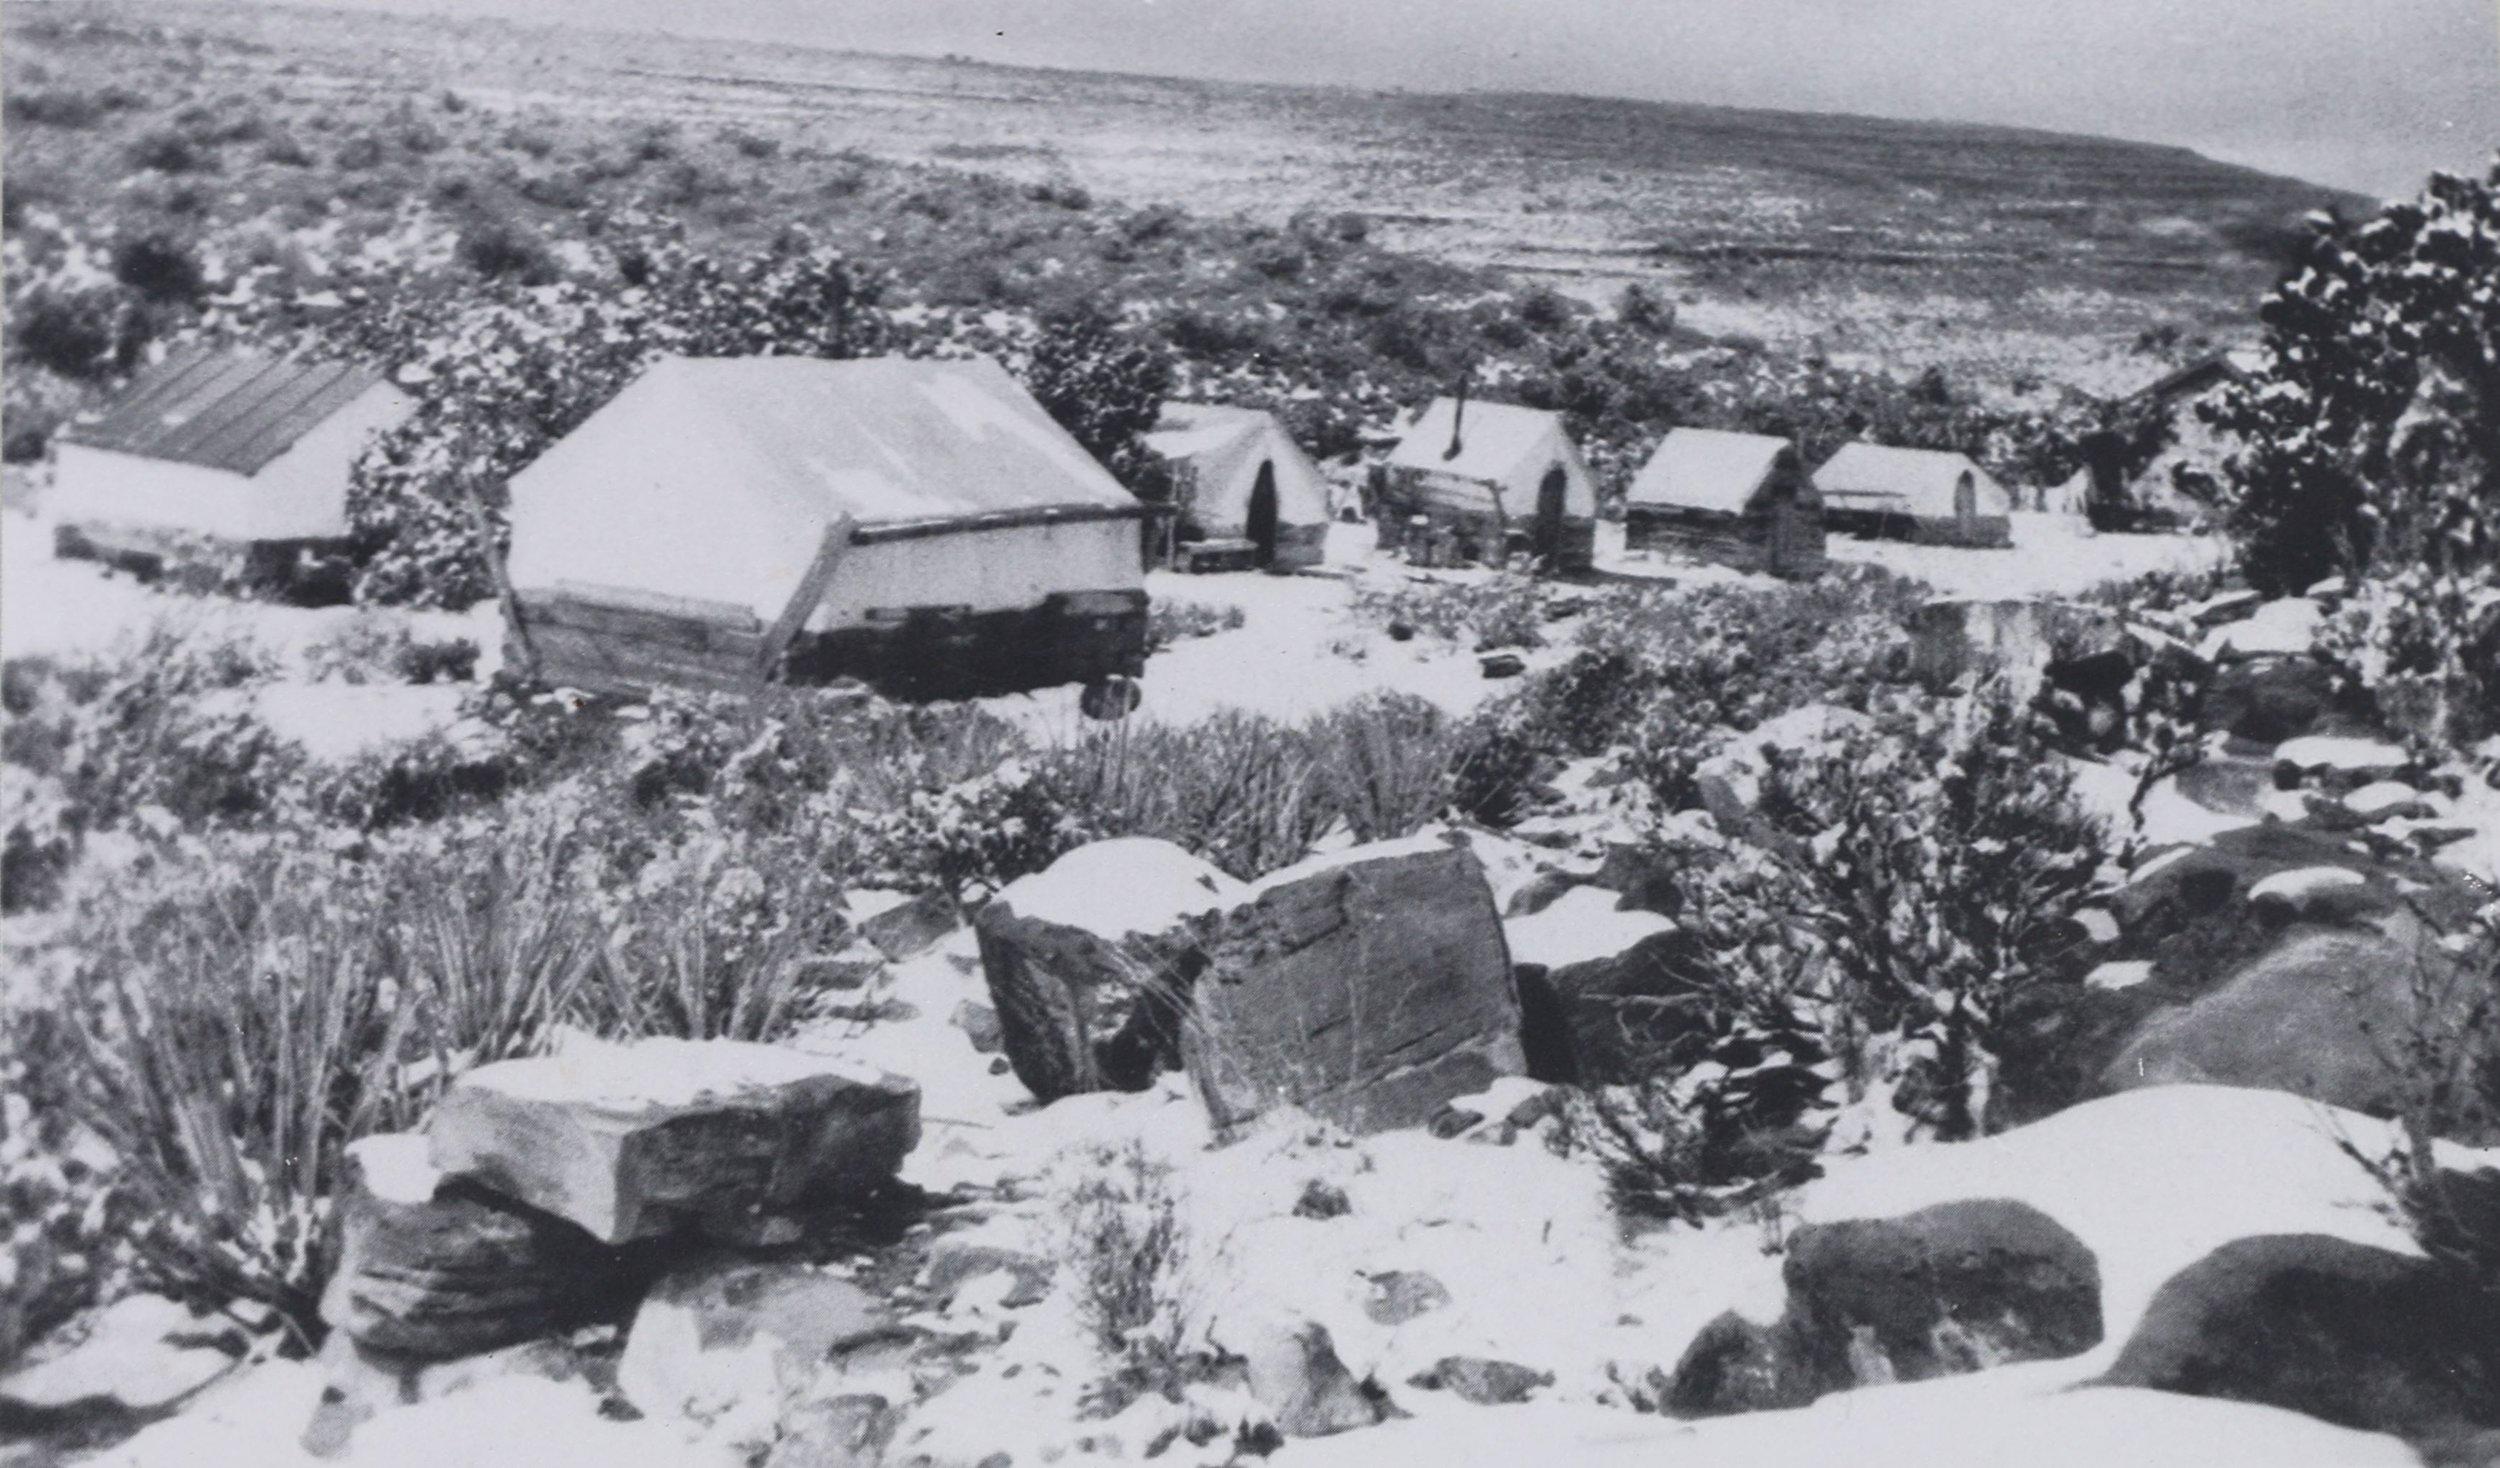 A 1917 winter photo shows Grand Gulch near its peak population.